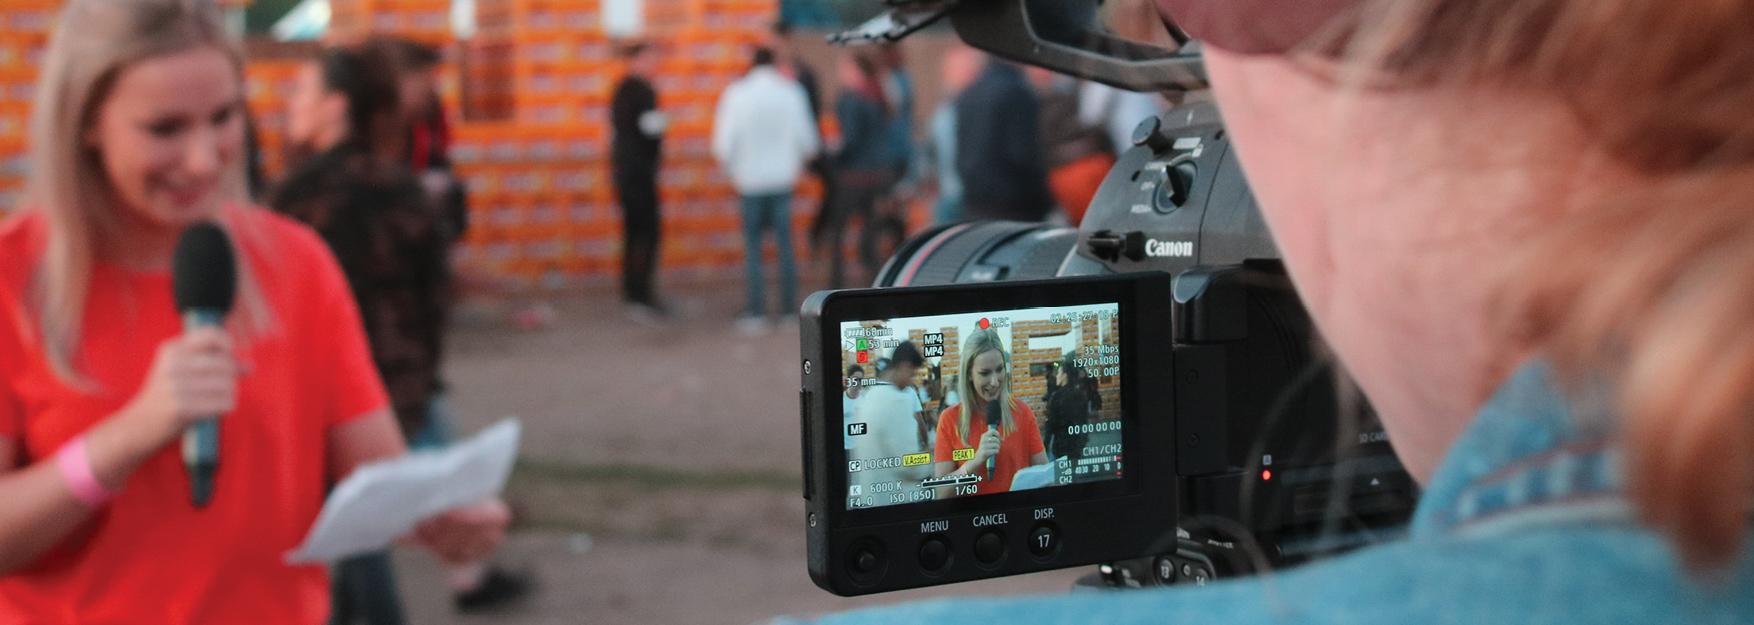 Bevrijdingsfestival-interview-presentatie